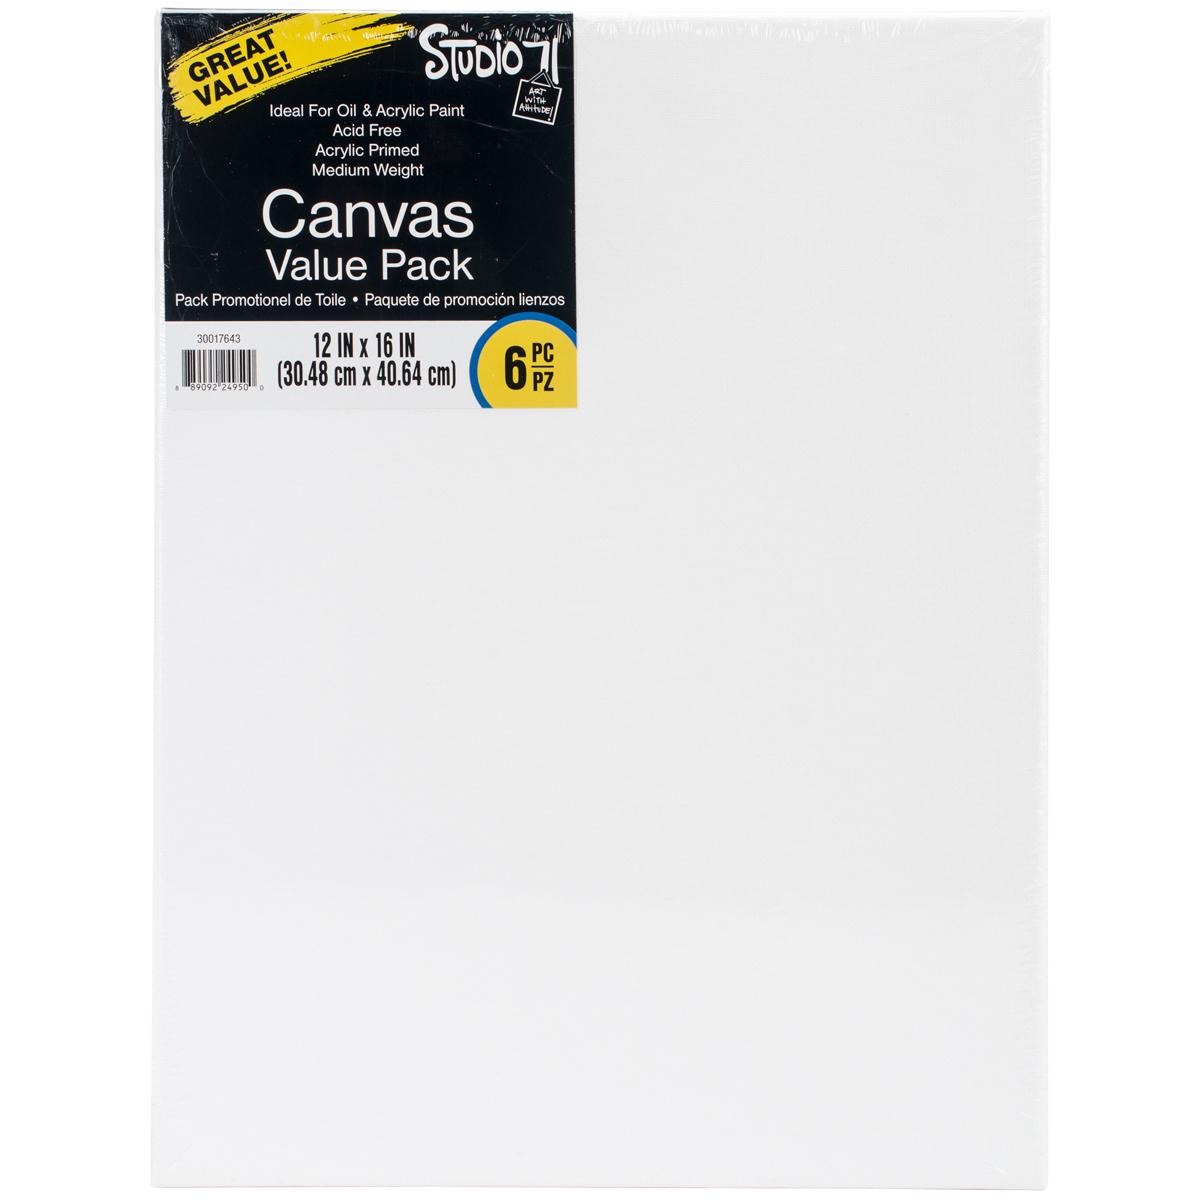 Studio 71 Stretched Canvas Value Pack 6/Pkg-12X16